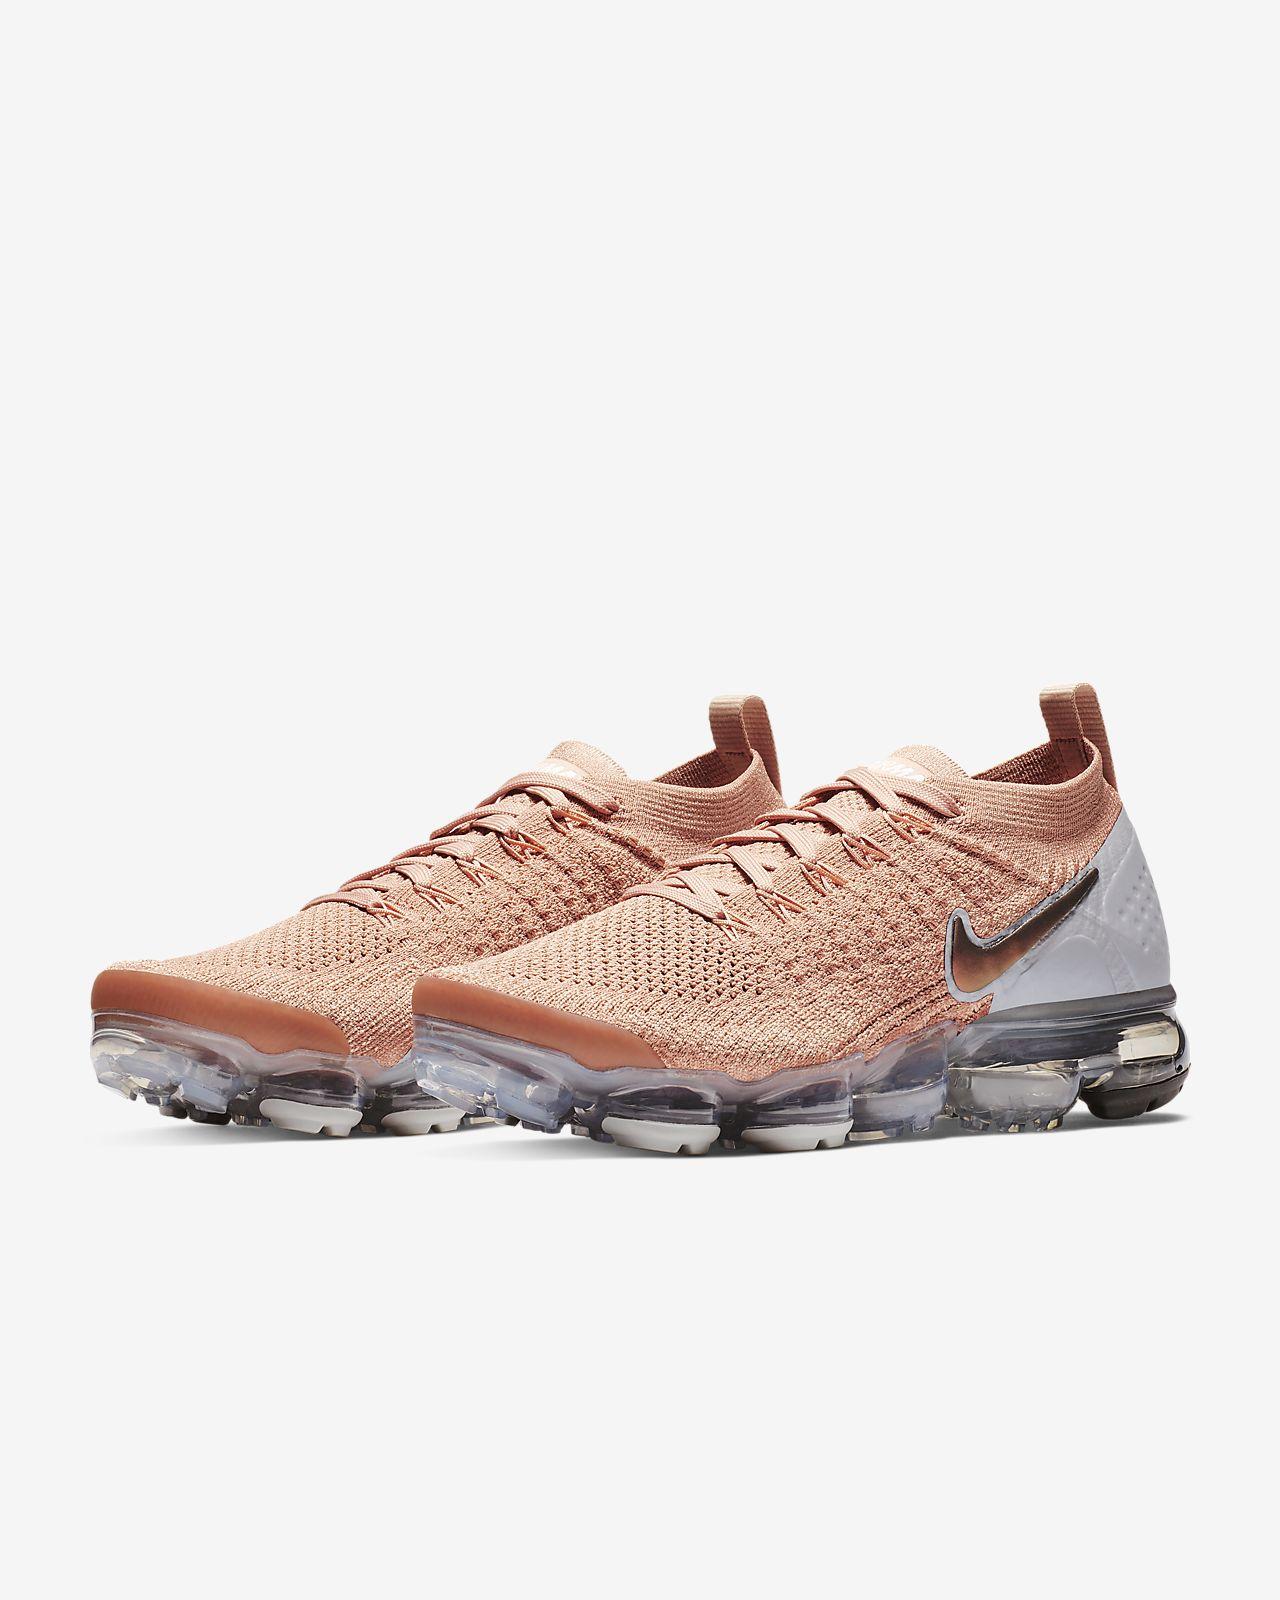 new product c9b57 dce11 ... Nike Air VaporMax Flyknit 2 Women s Shoe